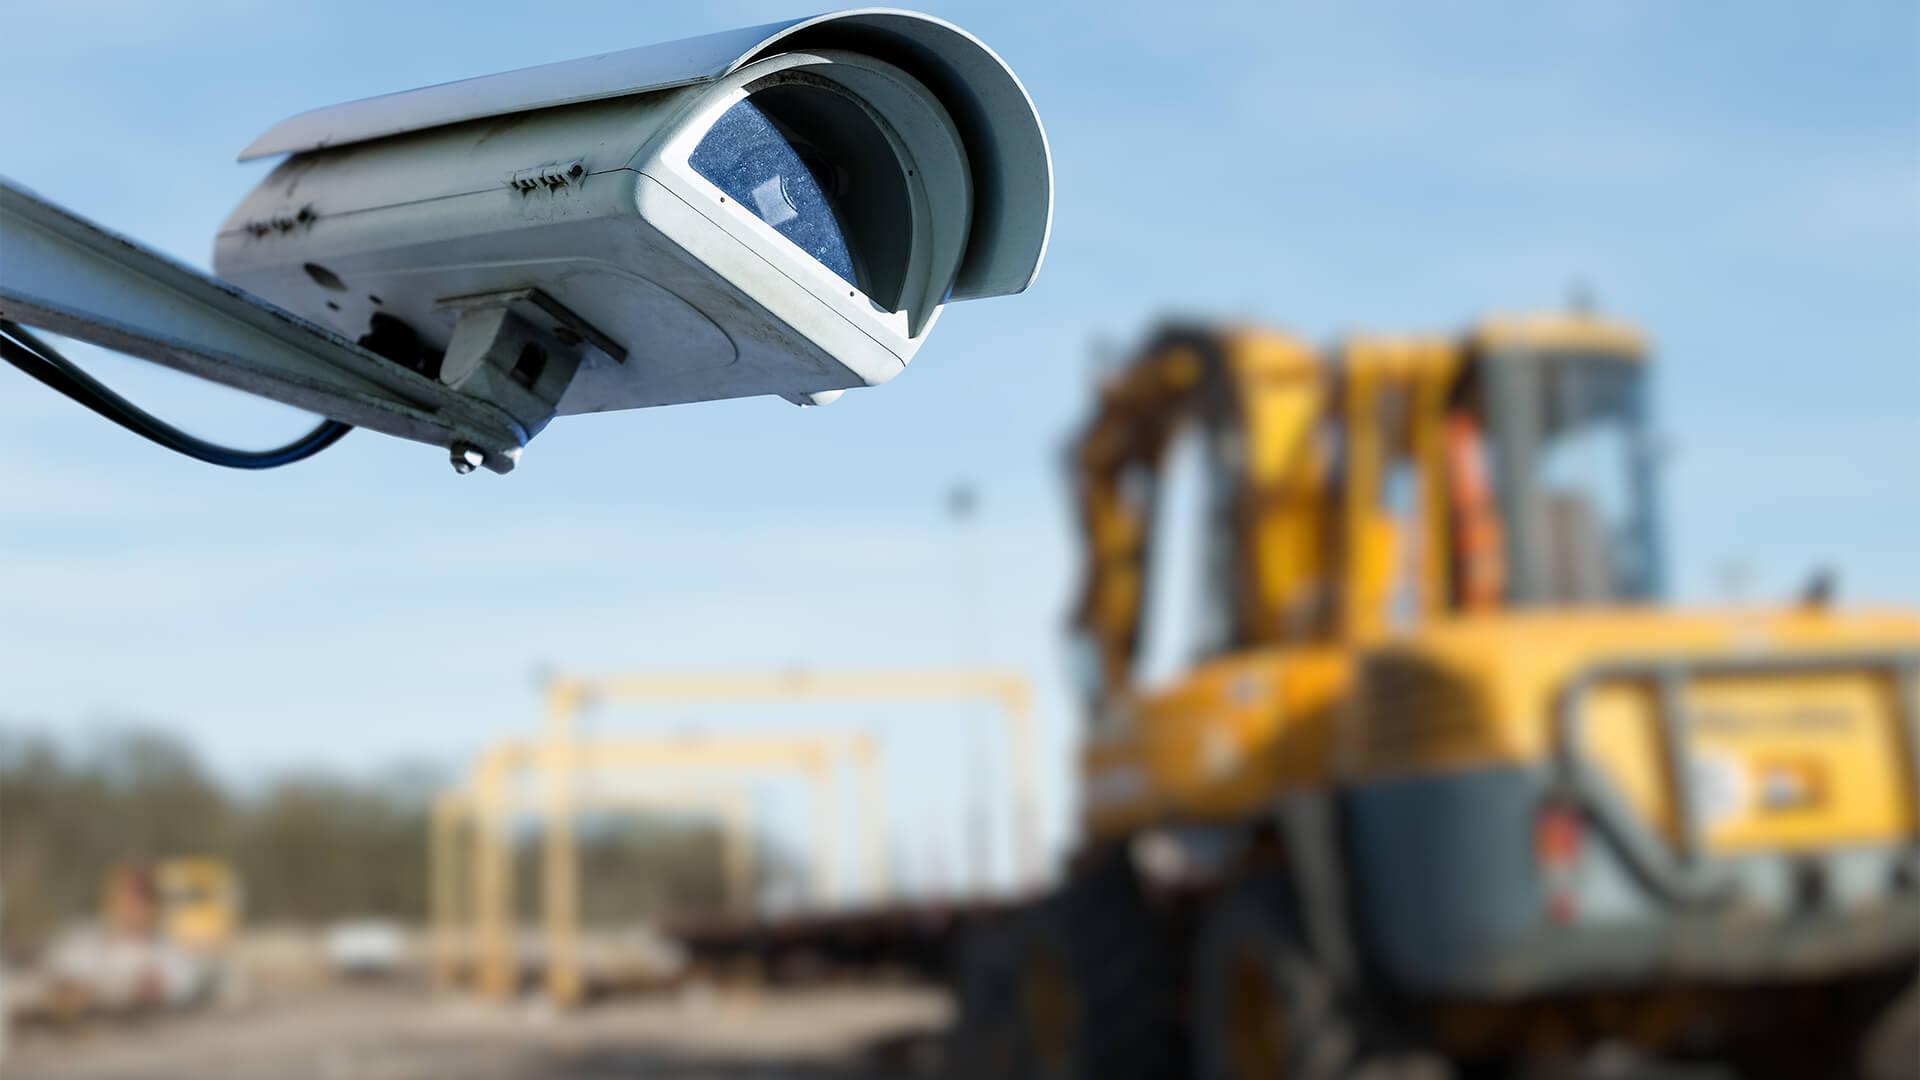 CCTV on a construction site